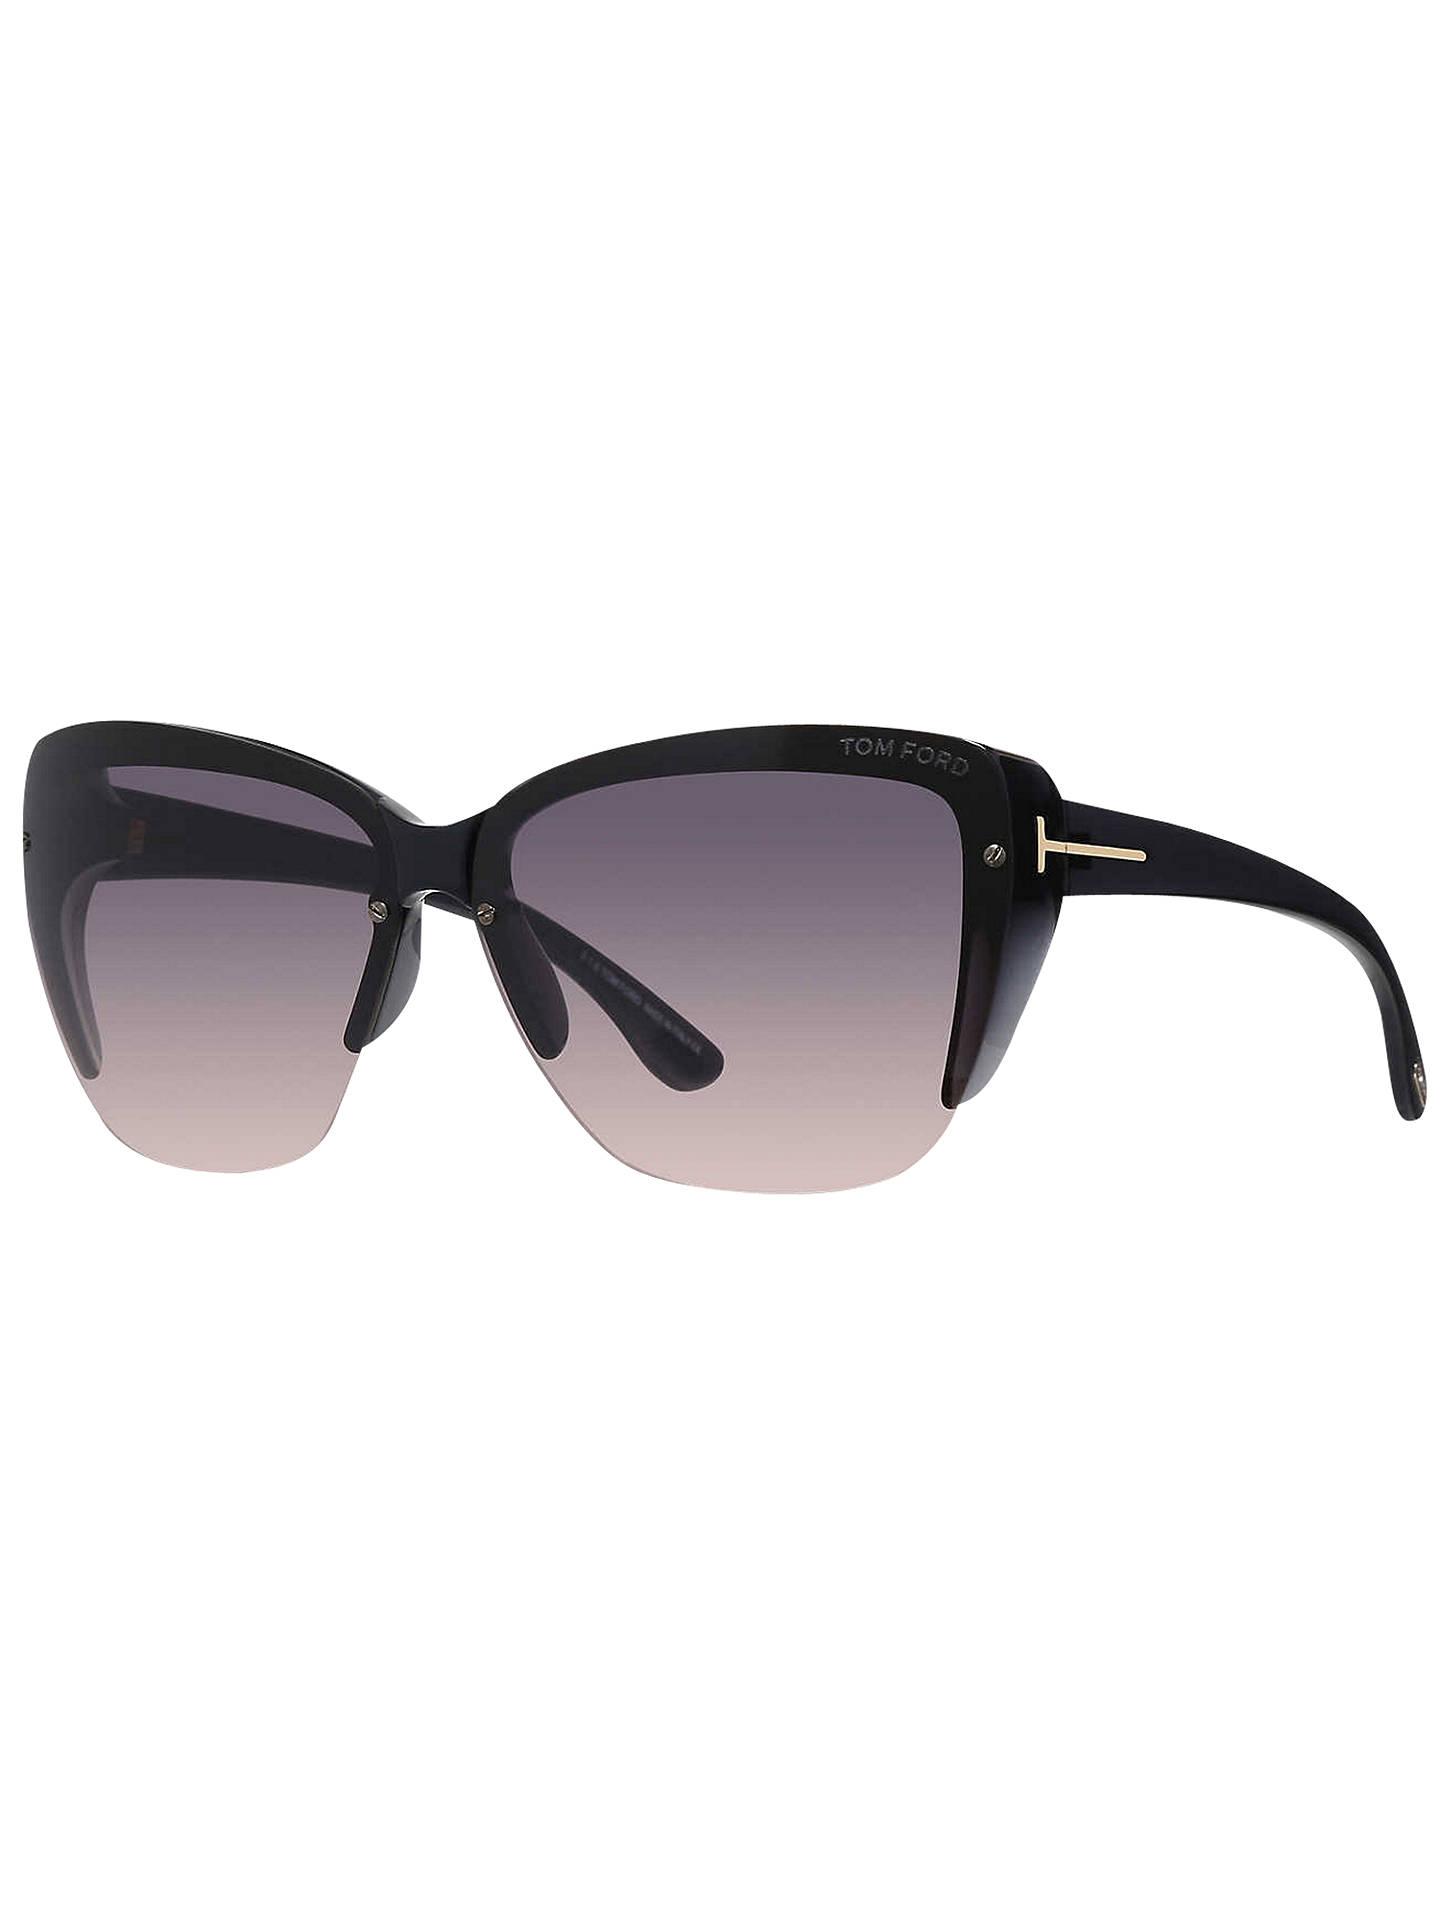 0e5dad6cb2c9 TOM FORD FT0457 Poppy Half Frame Square Sunglasses at John Lewis ...